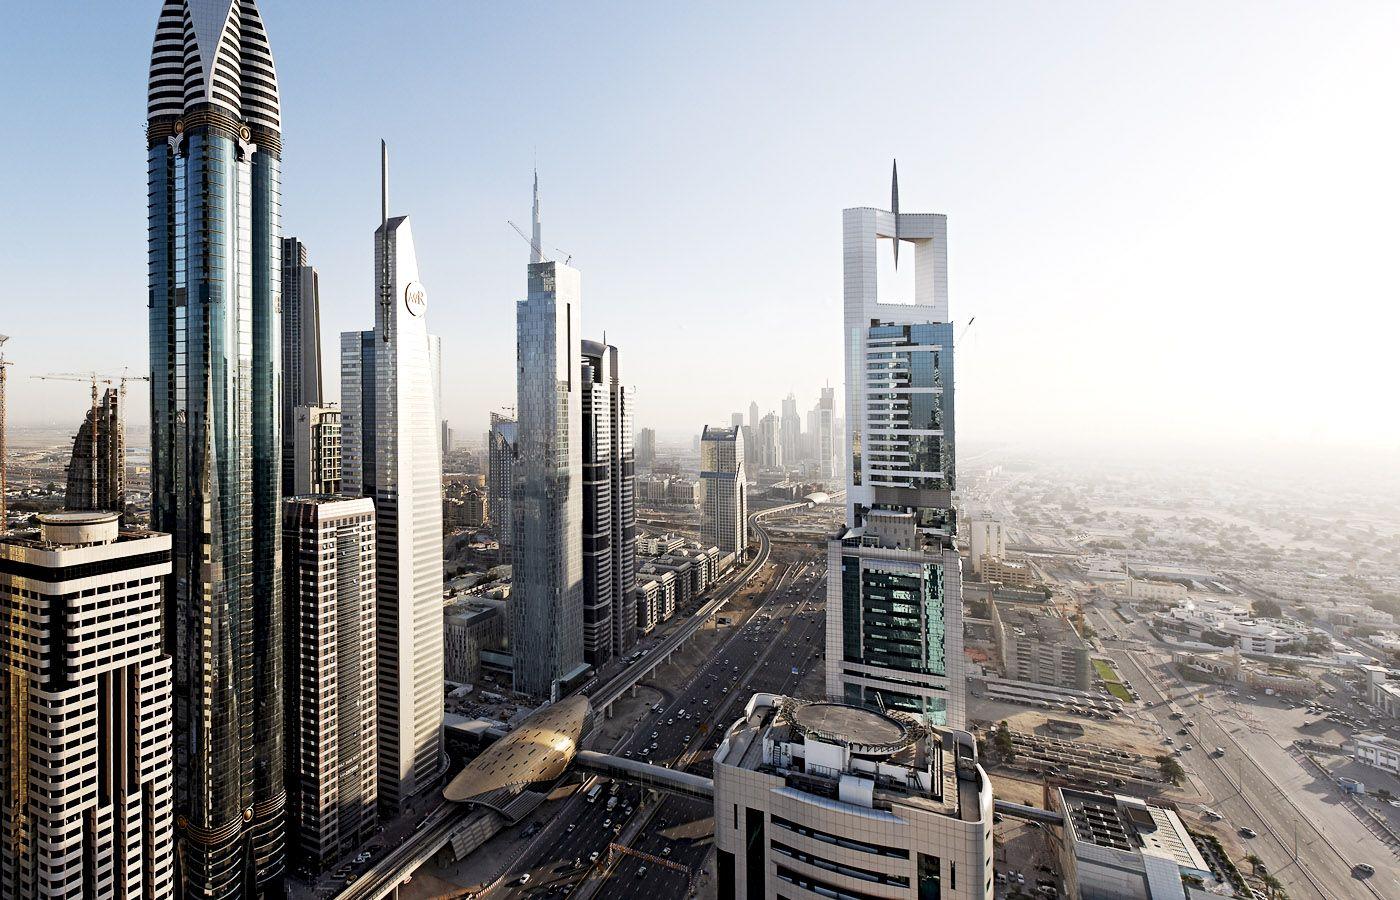 Cityscape-Dubai-Panorama.jpg (1400×900)